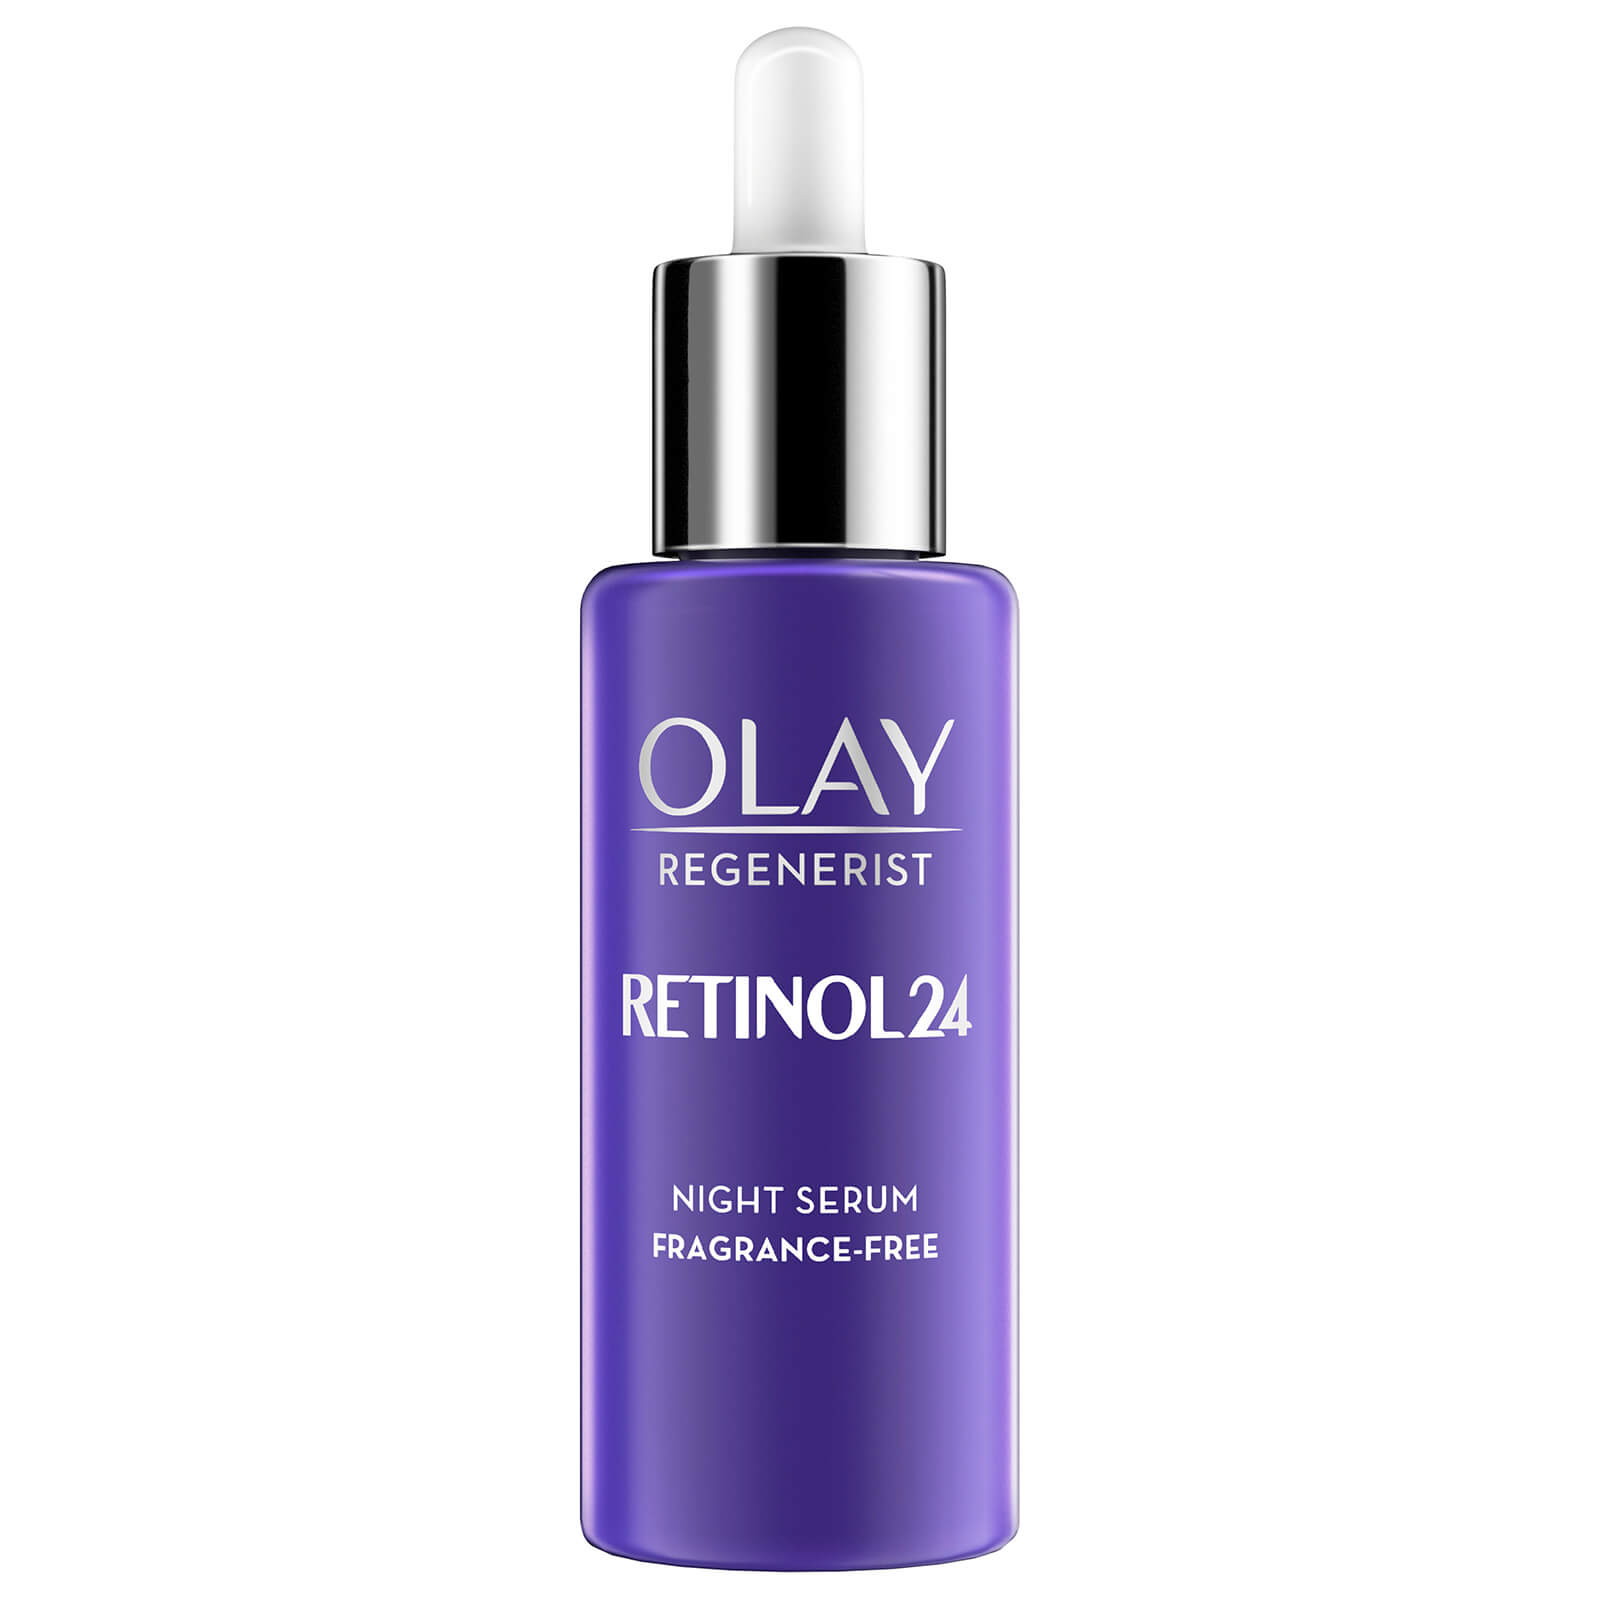 Купить Olay Retinol 24 Fragrance Free Night Serum for Smooth and Glowing Skin 40ml